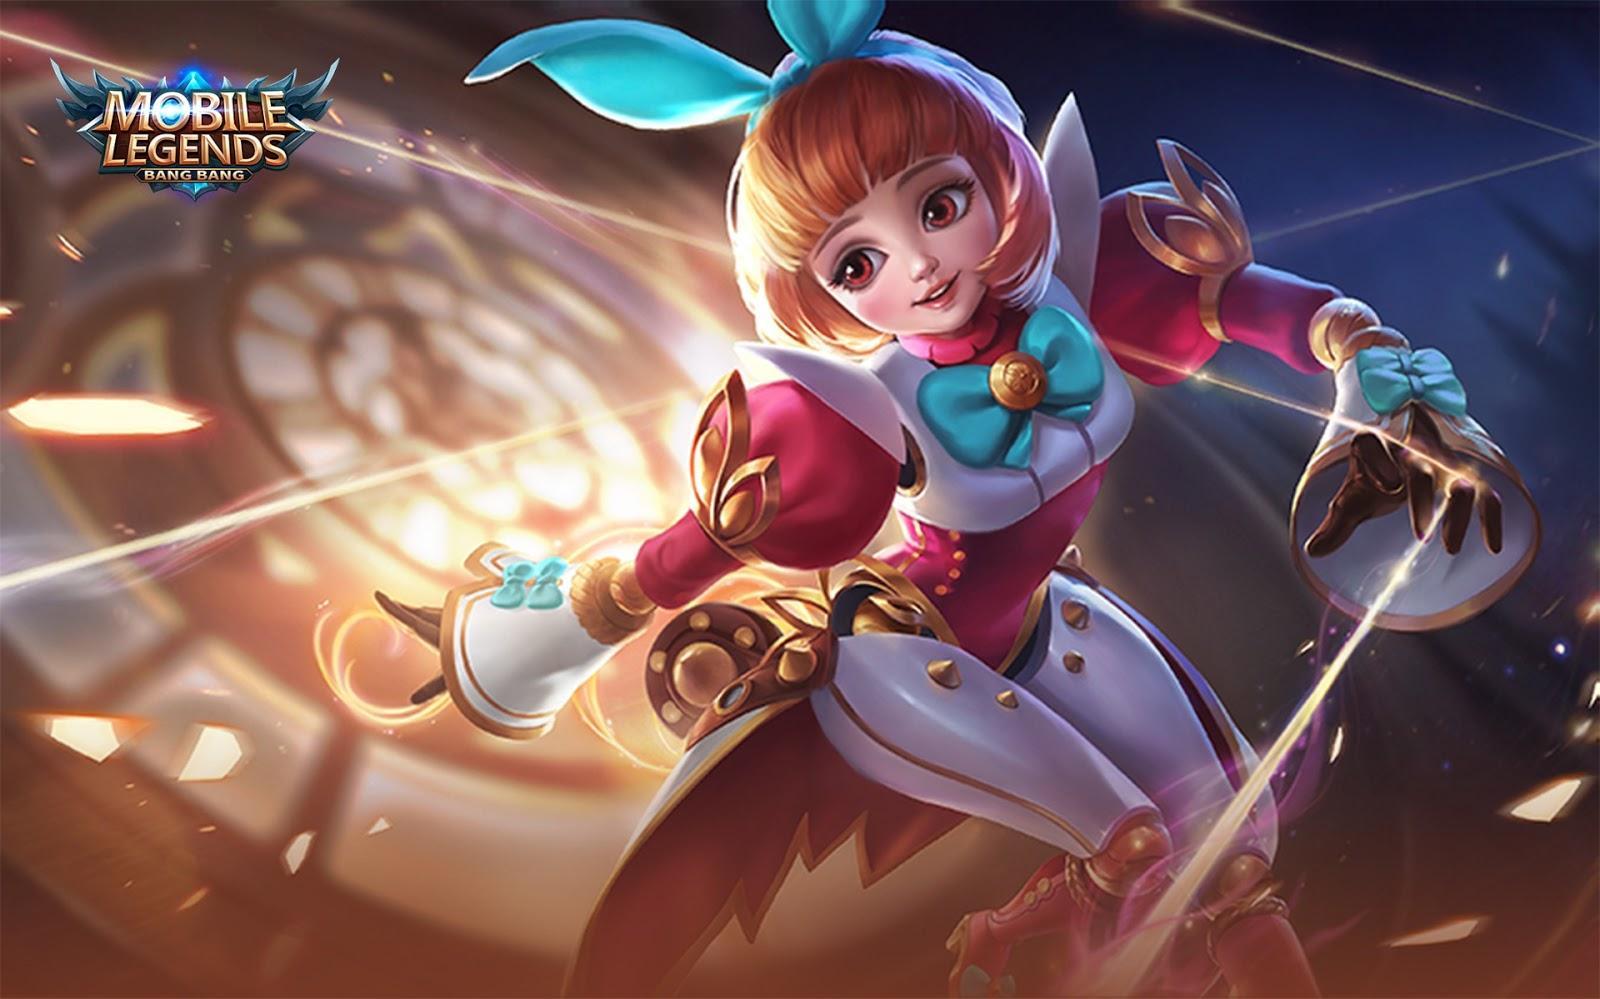 Angela Bunnylove Wallpaper Mobile Legends HD for PC